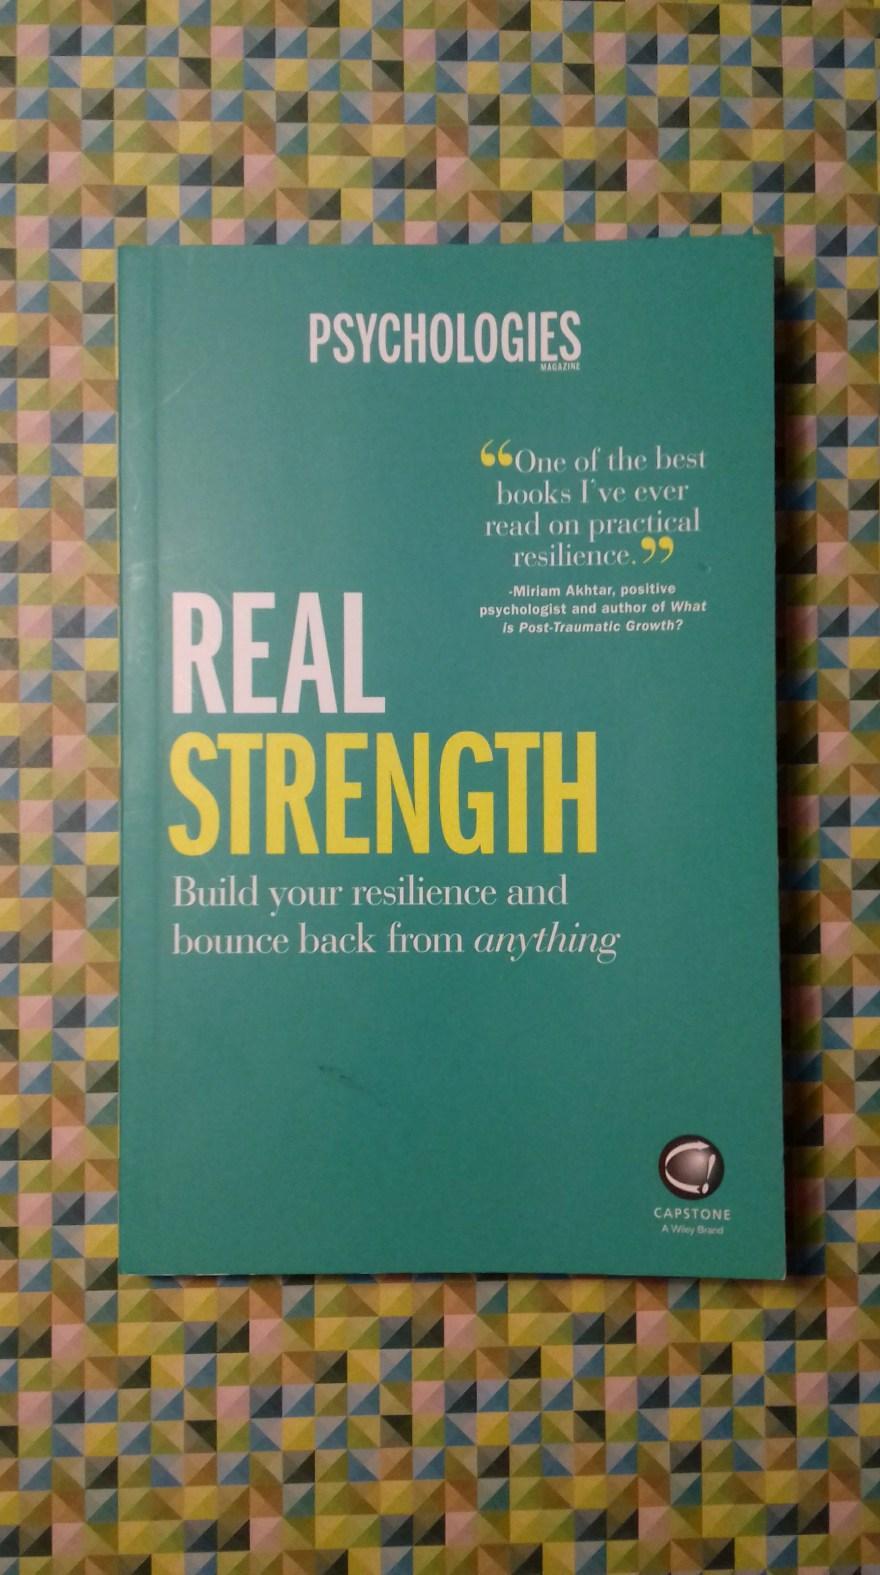 Real Strength by Psychologies | Capstone on Alternative-Read.com